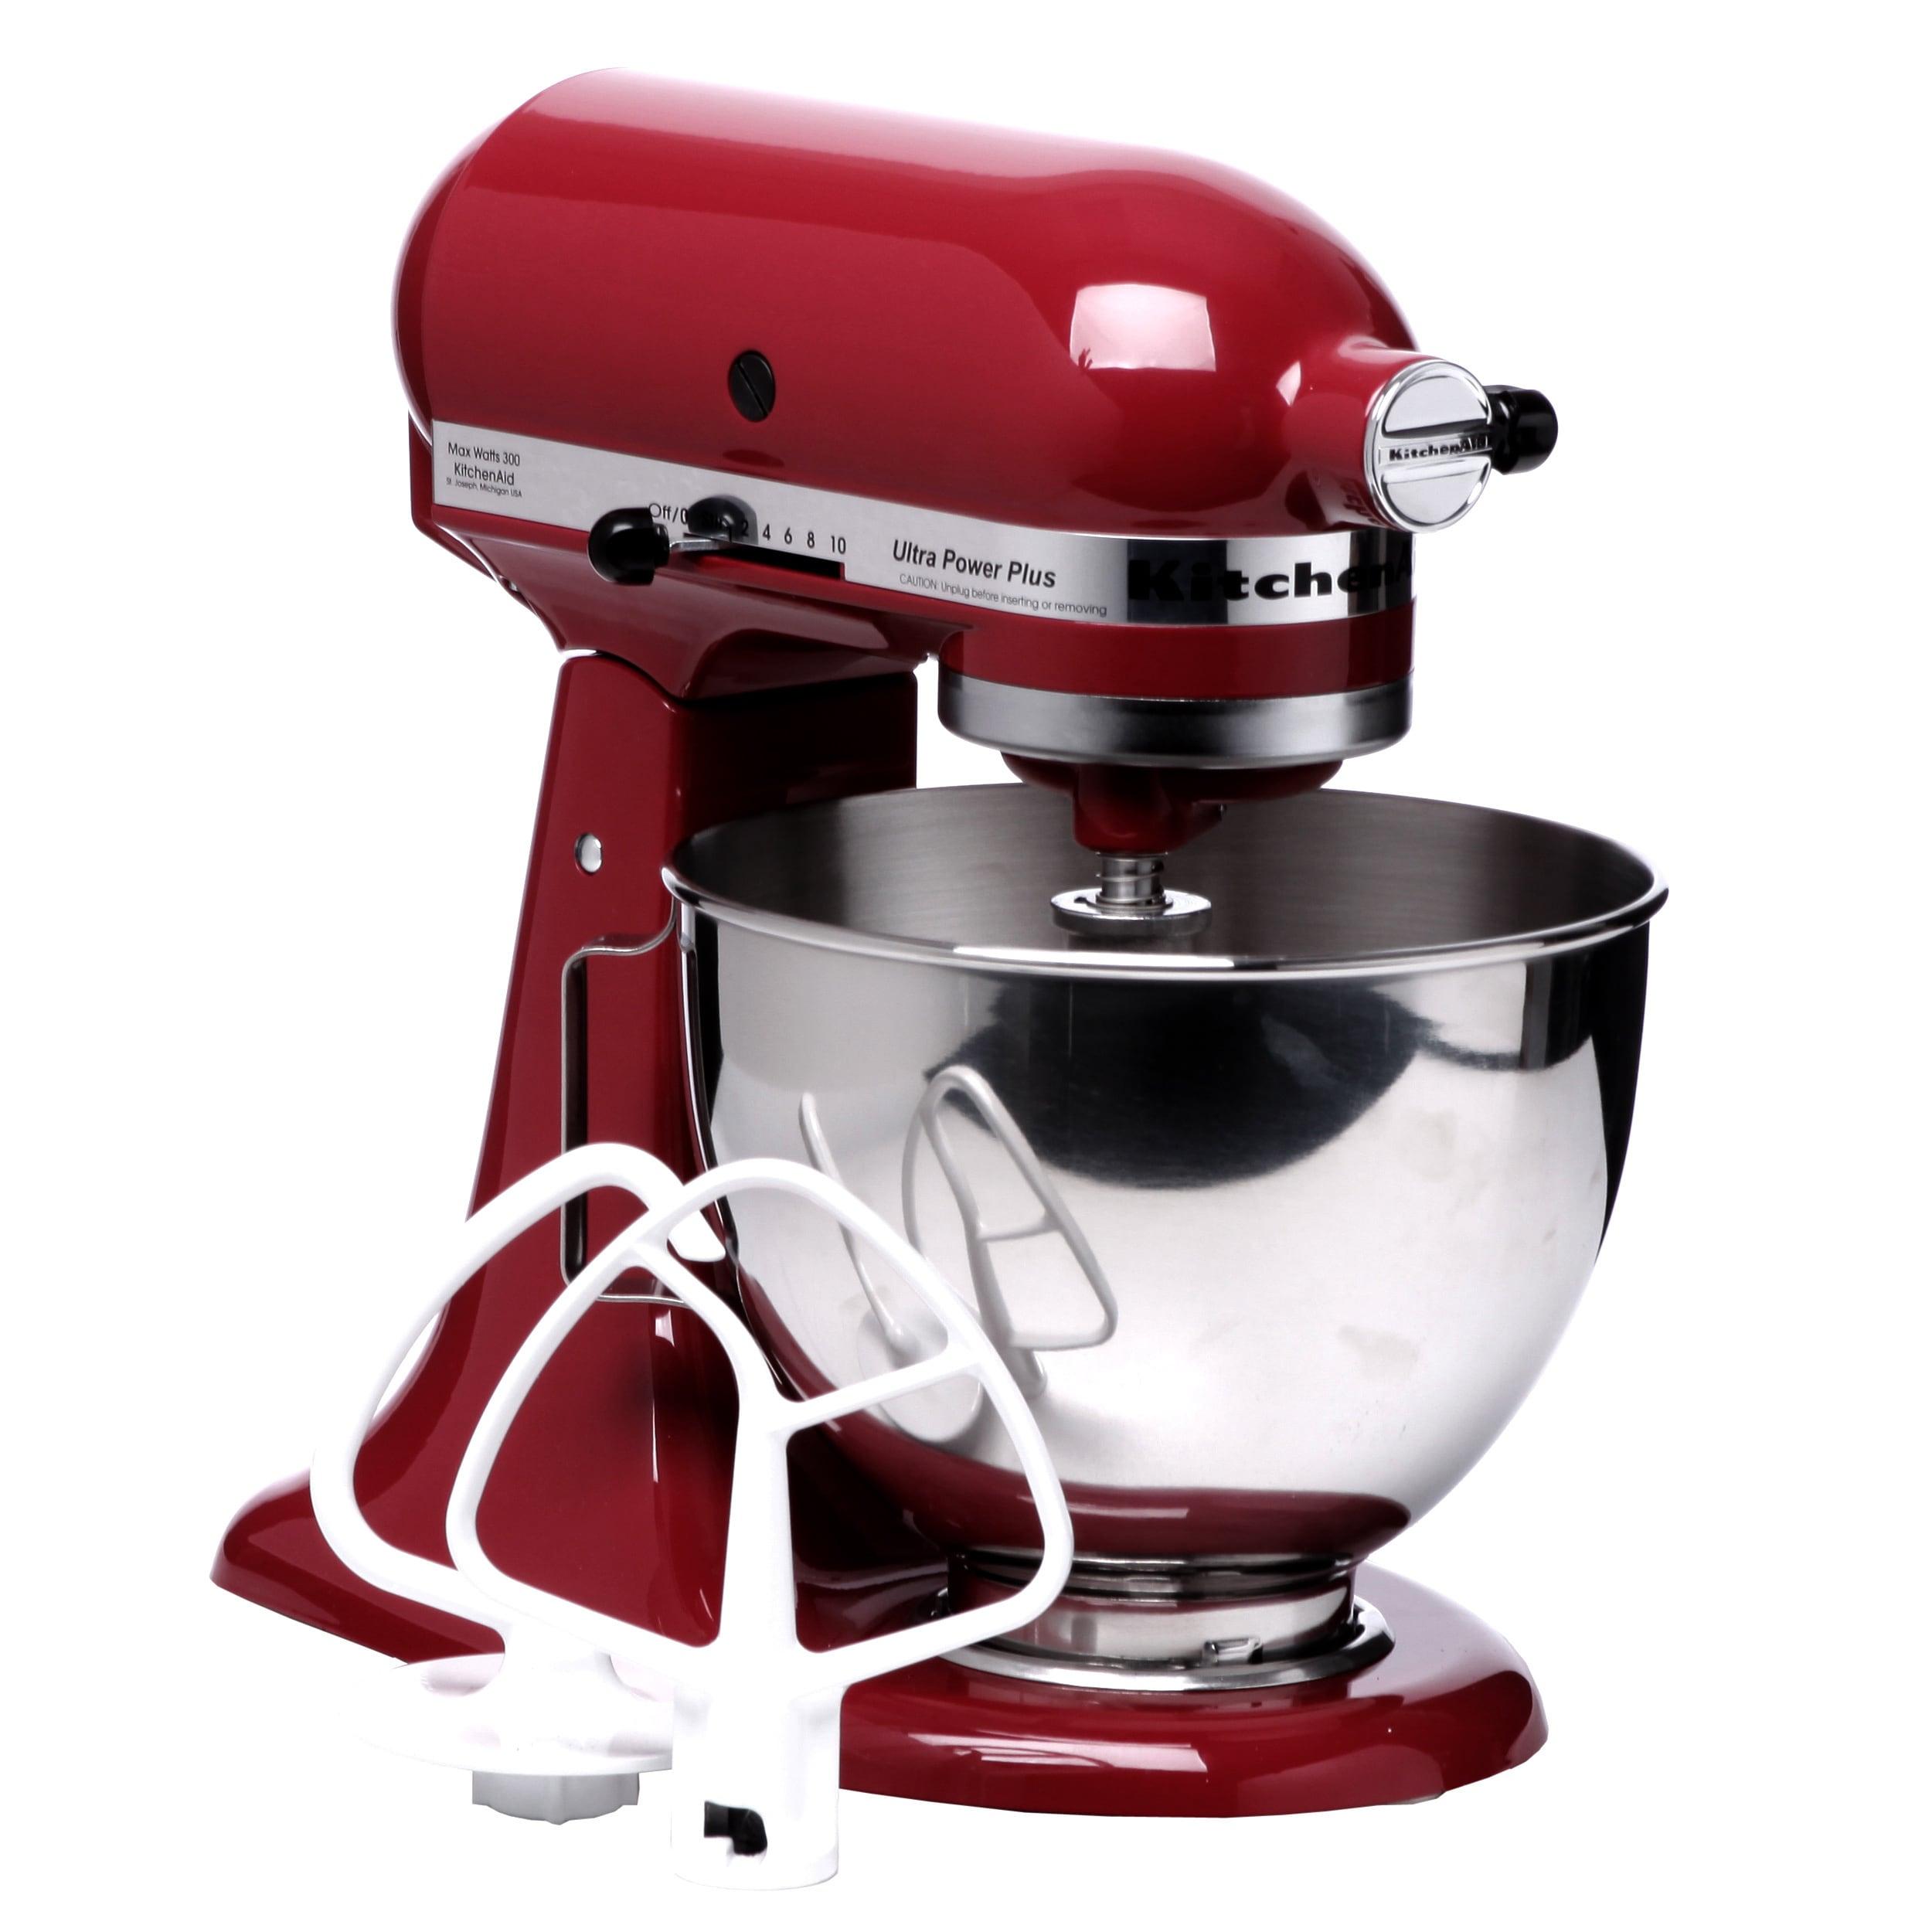 Kitchenaid 300 Watt Mixer